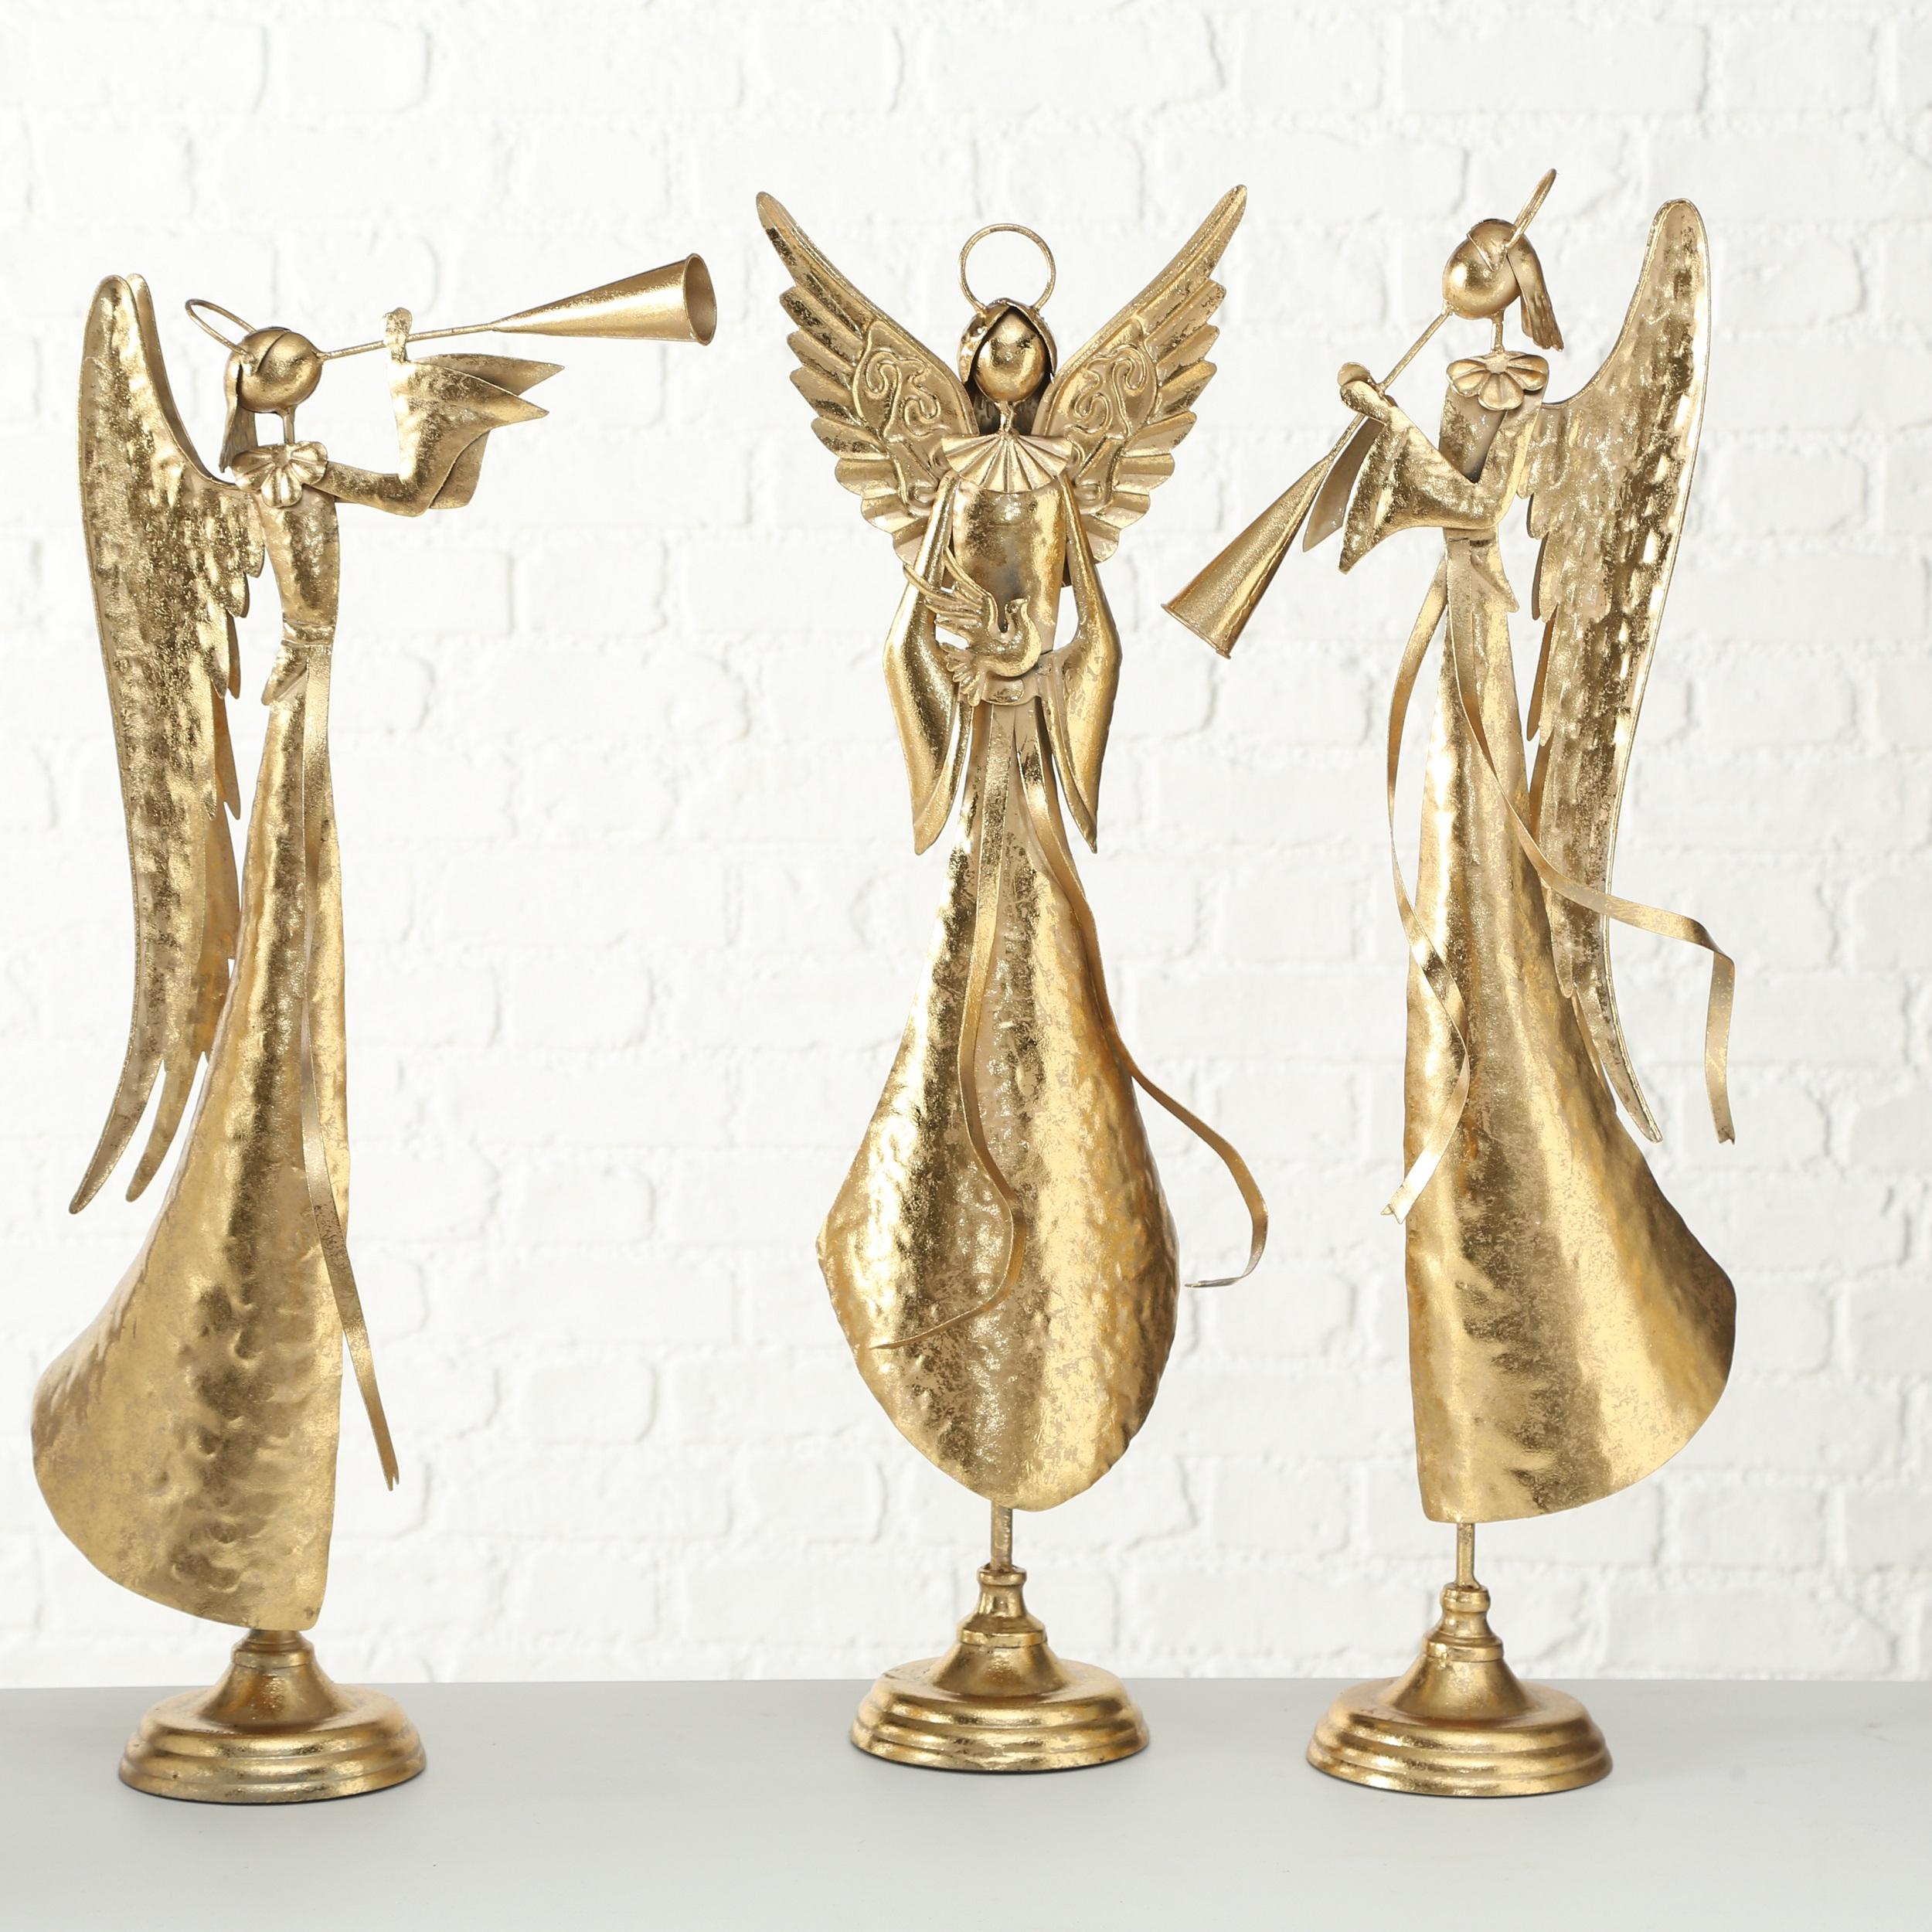 Decoratiune metalica Cory Angel Auriu, Modele Asortate, l29xA13xH72 cm poza